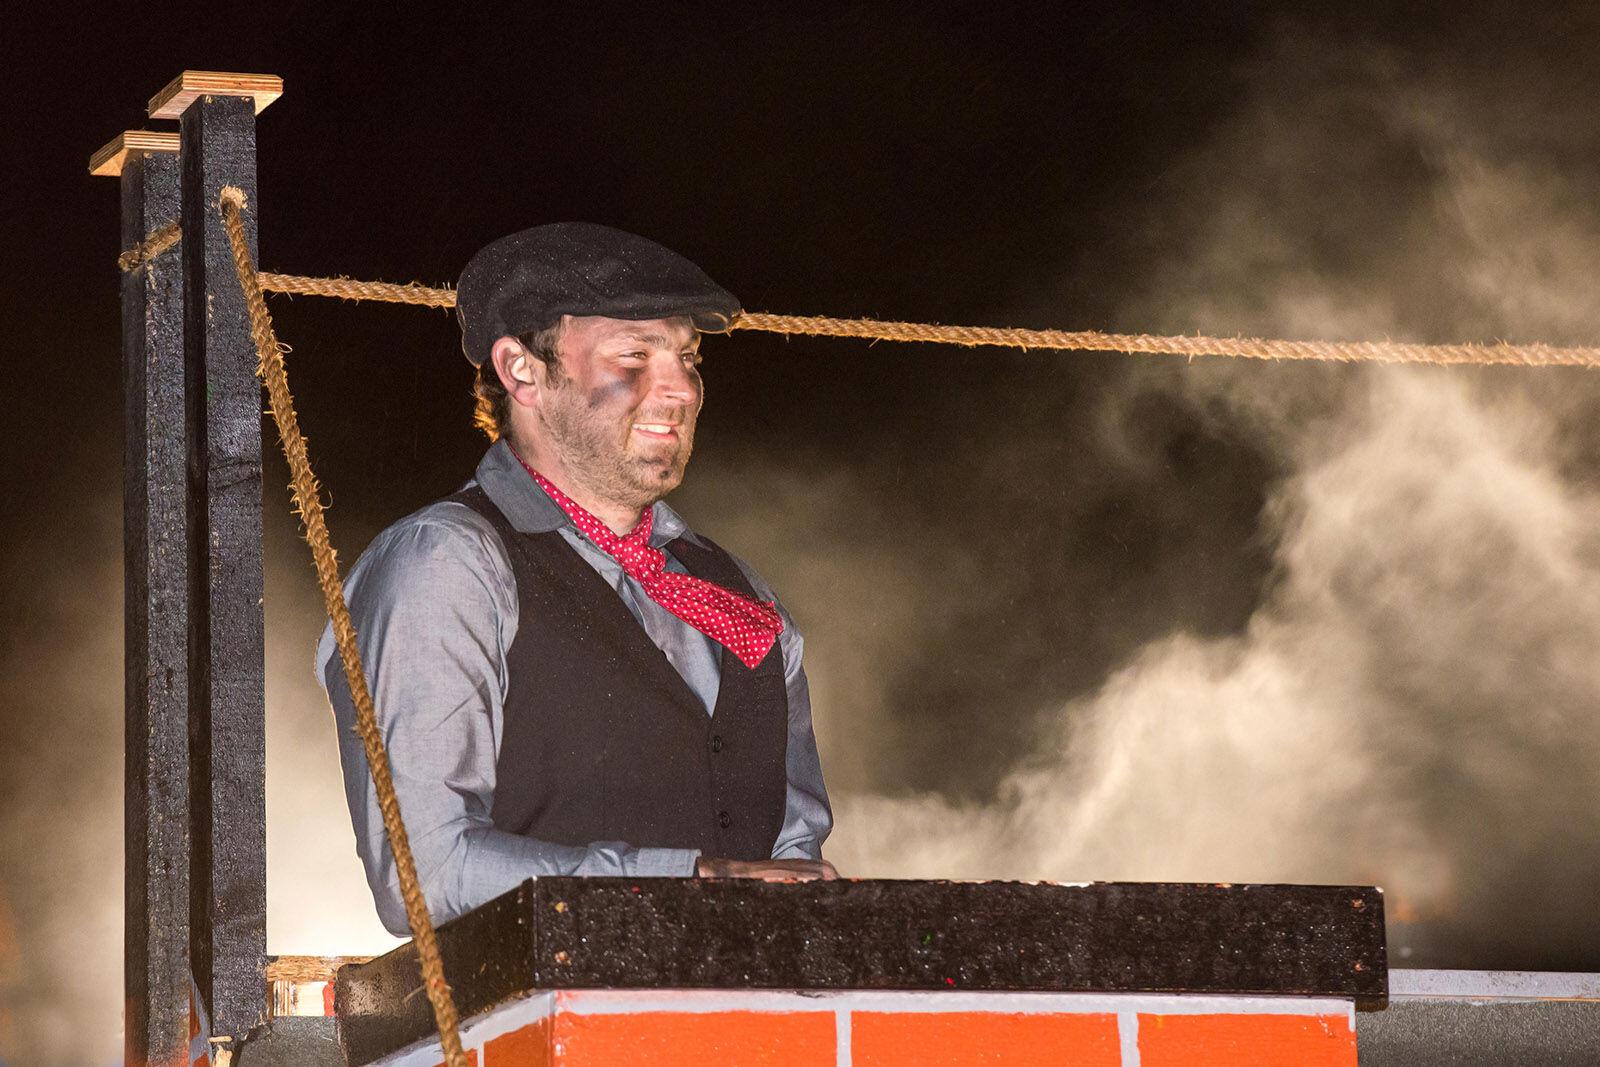 Hatherleigh carnival chimney sweep